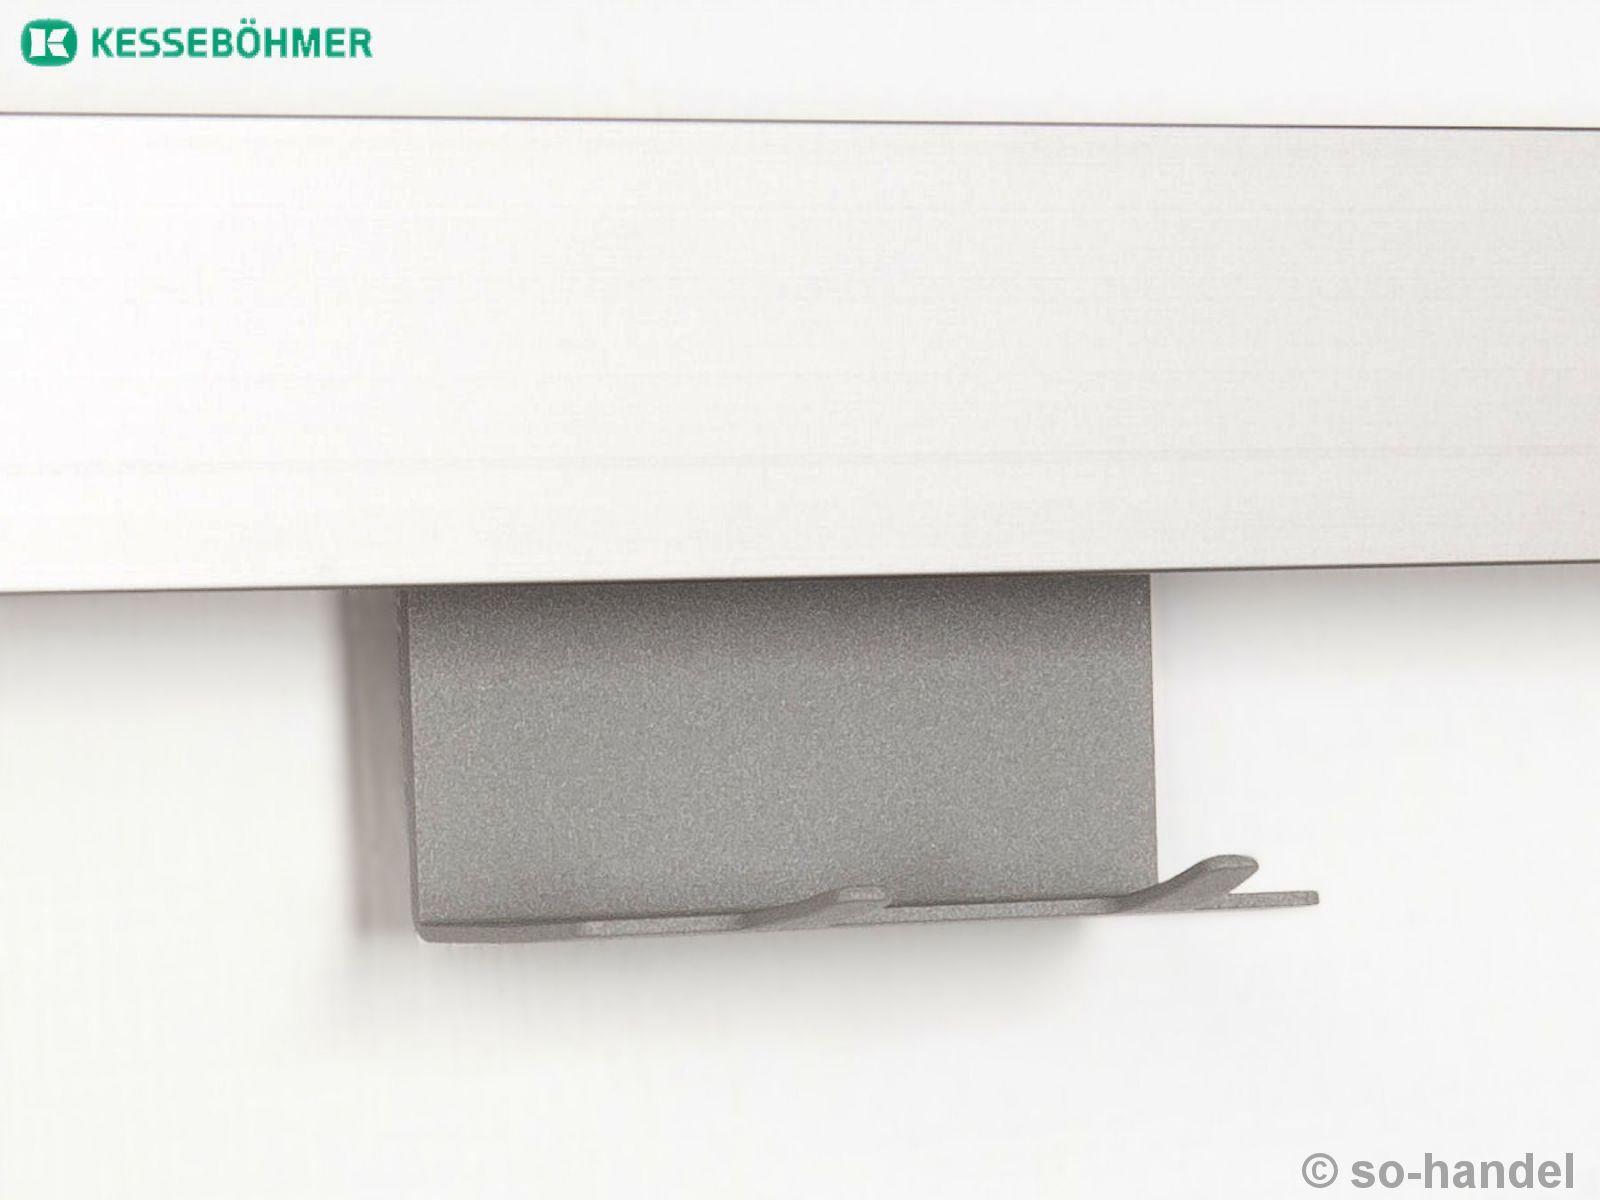 kesseb hmer linero mosaiq hakenleiste graphitschwarz 2 oder 6 haken relingsystem ebay. Black Bedroom Furniture Sets. Home Design Ideas